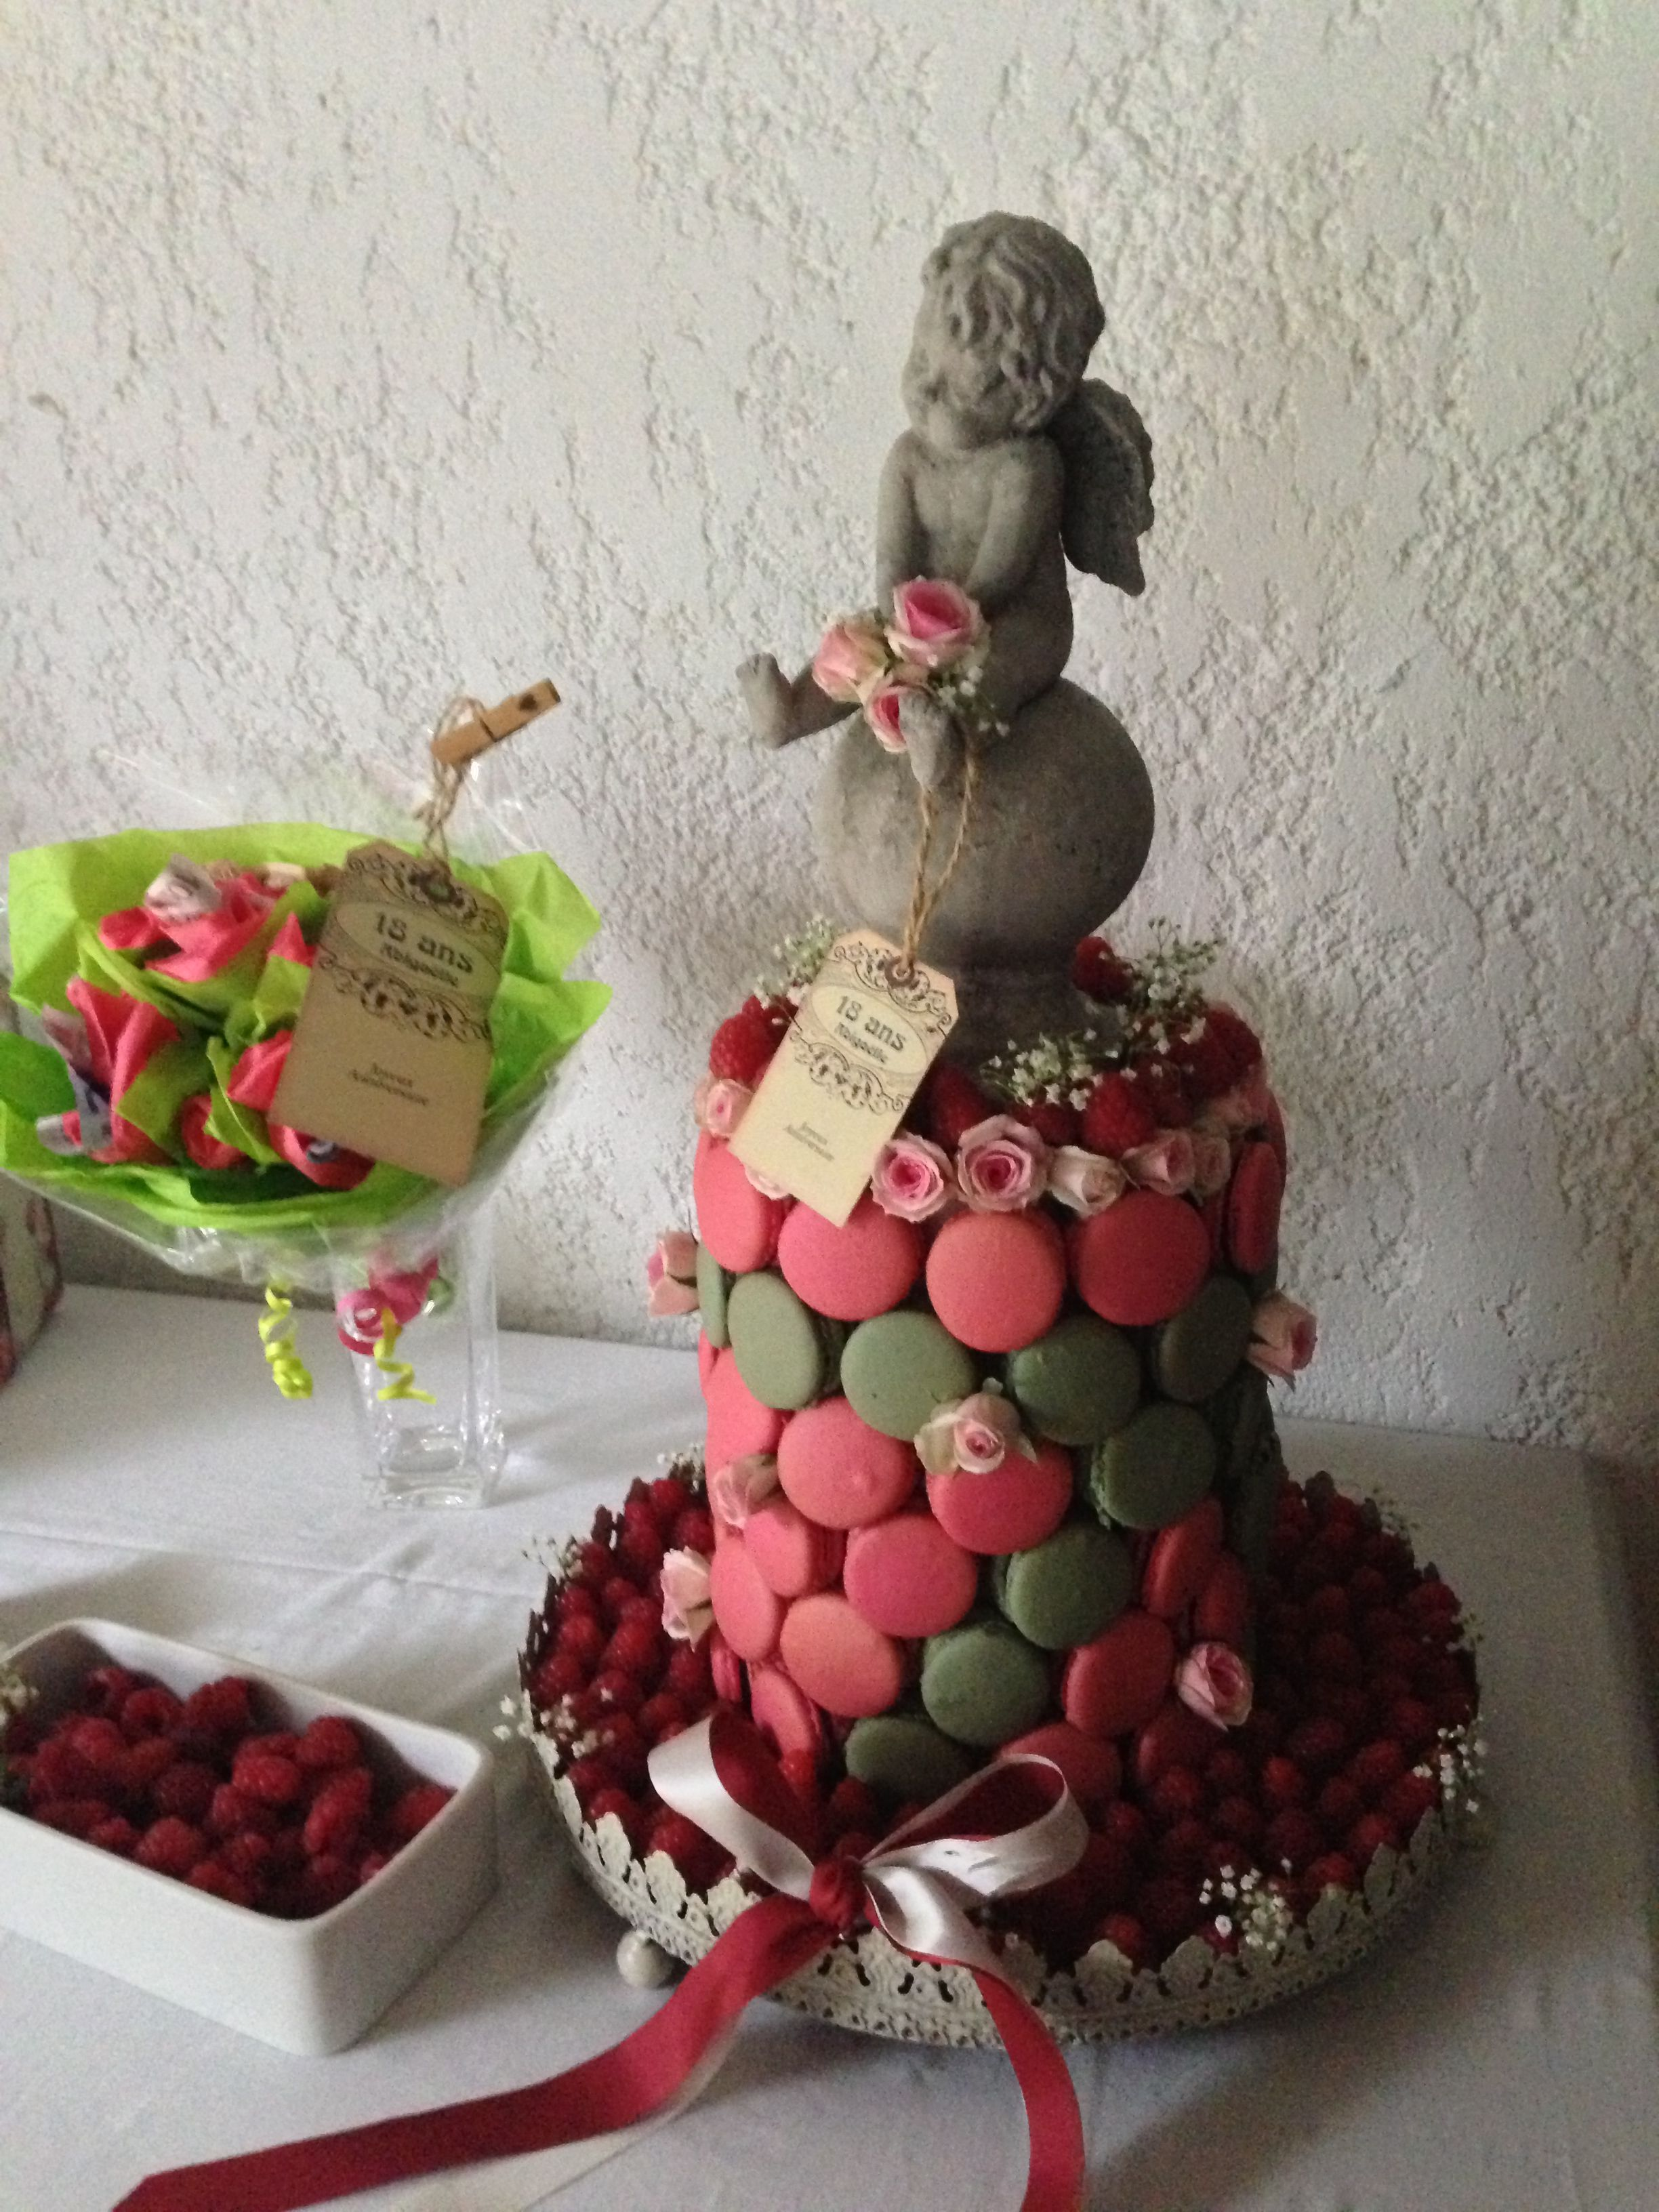 DIY Macarpn cake with raspberry